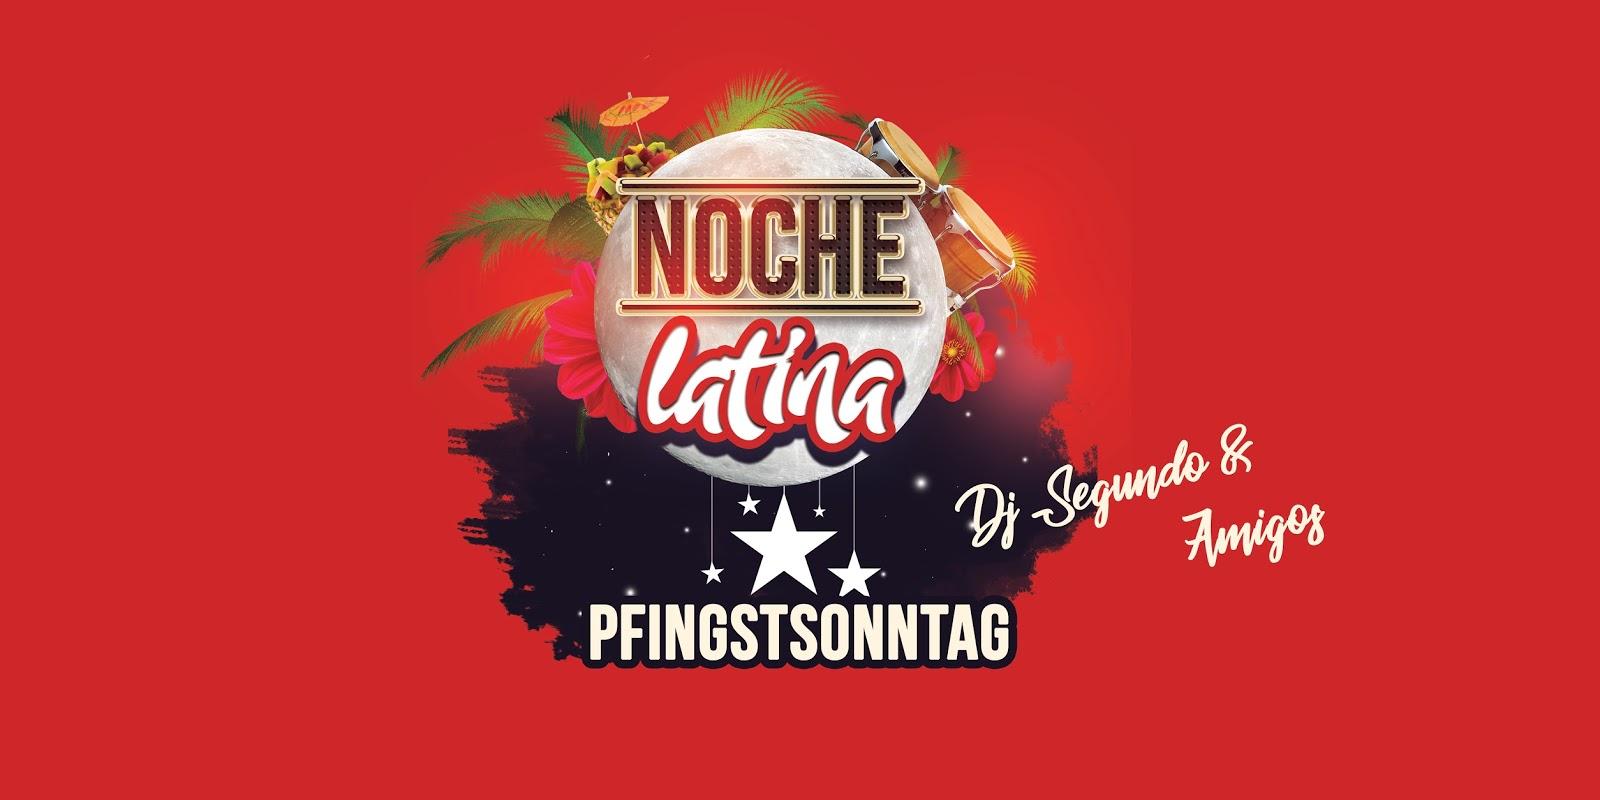 Noche Latina Pfingstsonntag